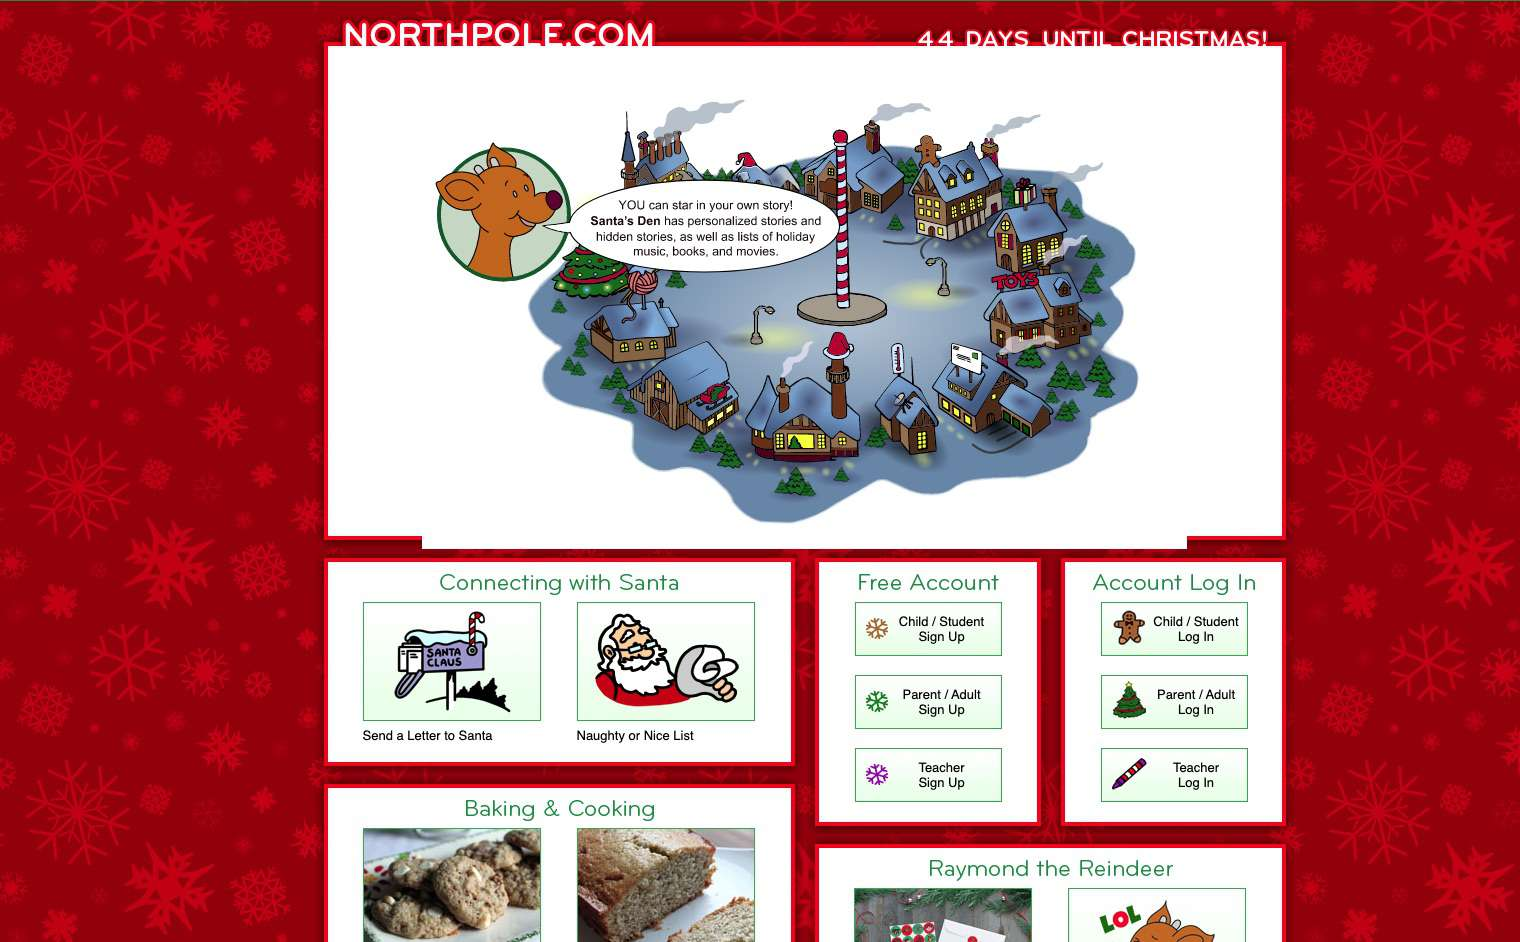 NorthPole.com Santa website